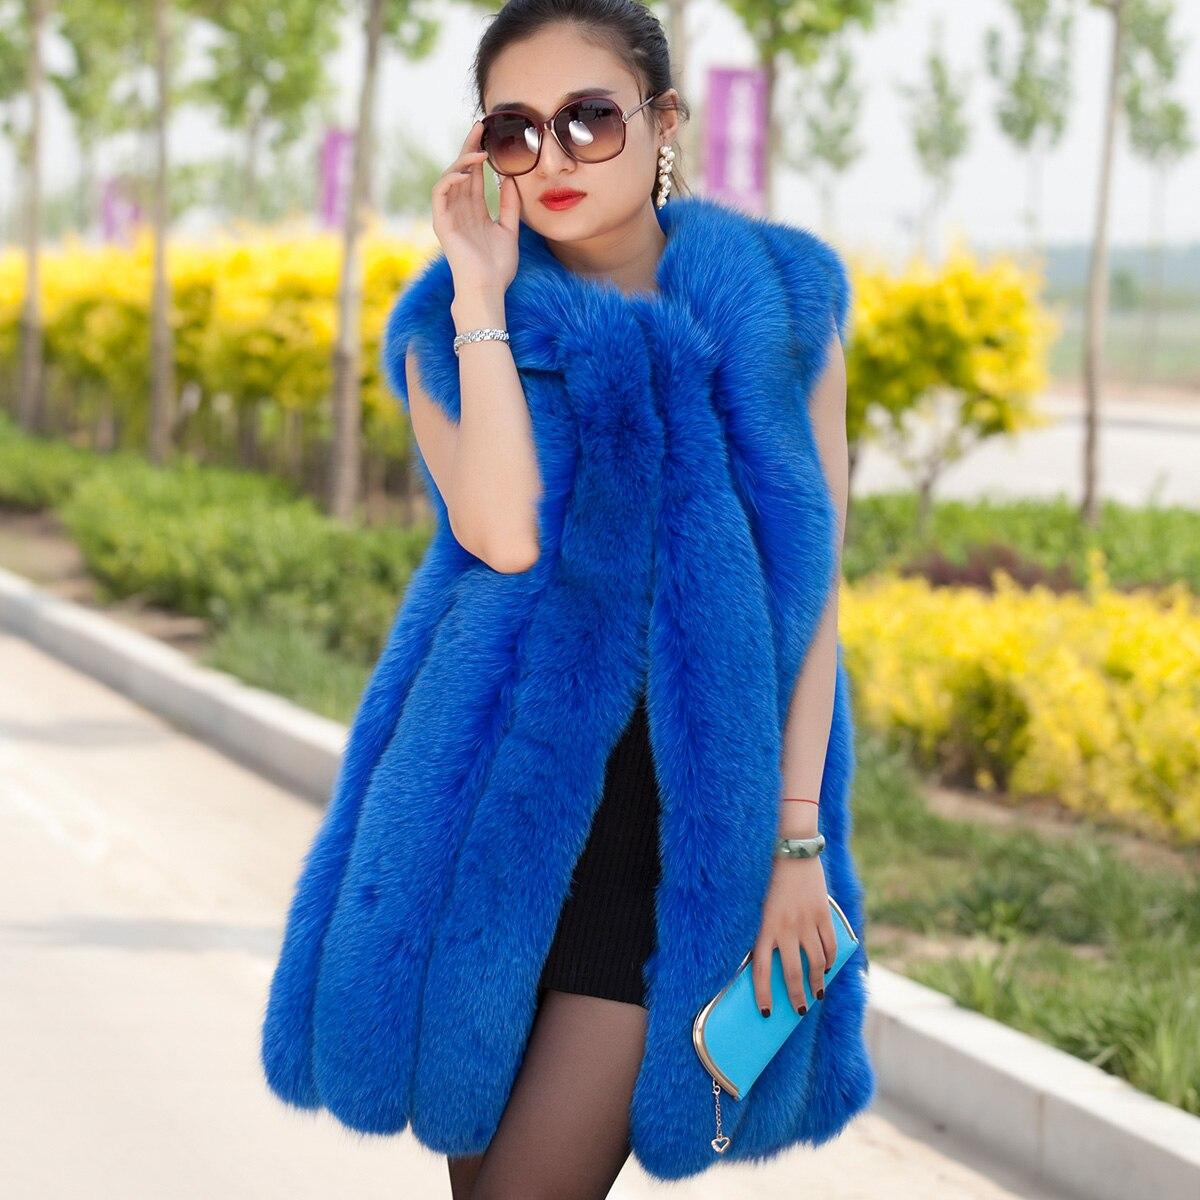 2017 Luxury Genuine Fox Fur Vest Waistcoat Autumn Winter Women Fur Outerwear Coats Lady Gilet Cotton Lining 0722